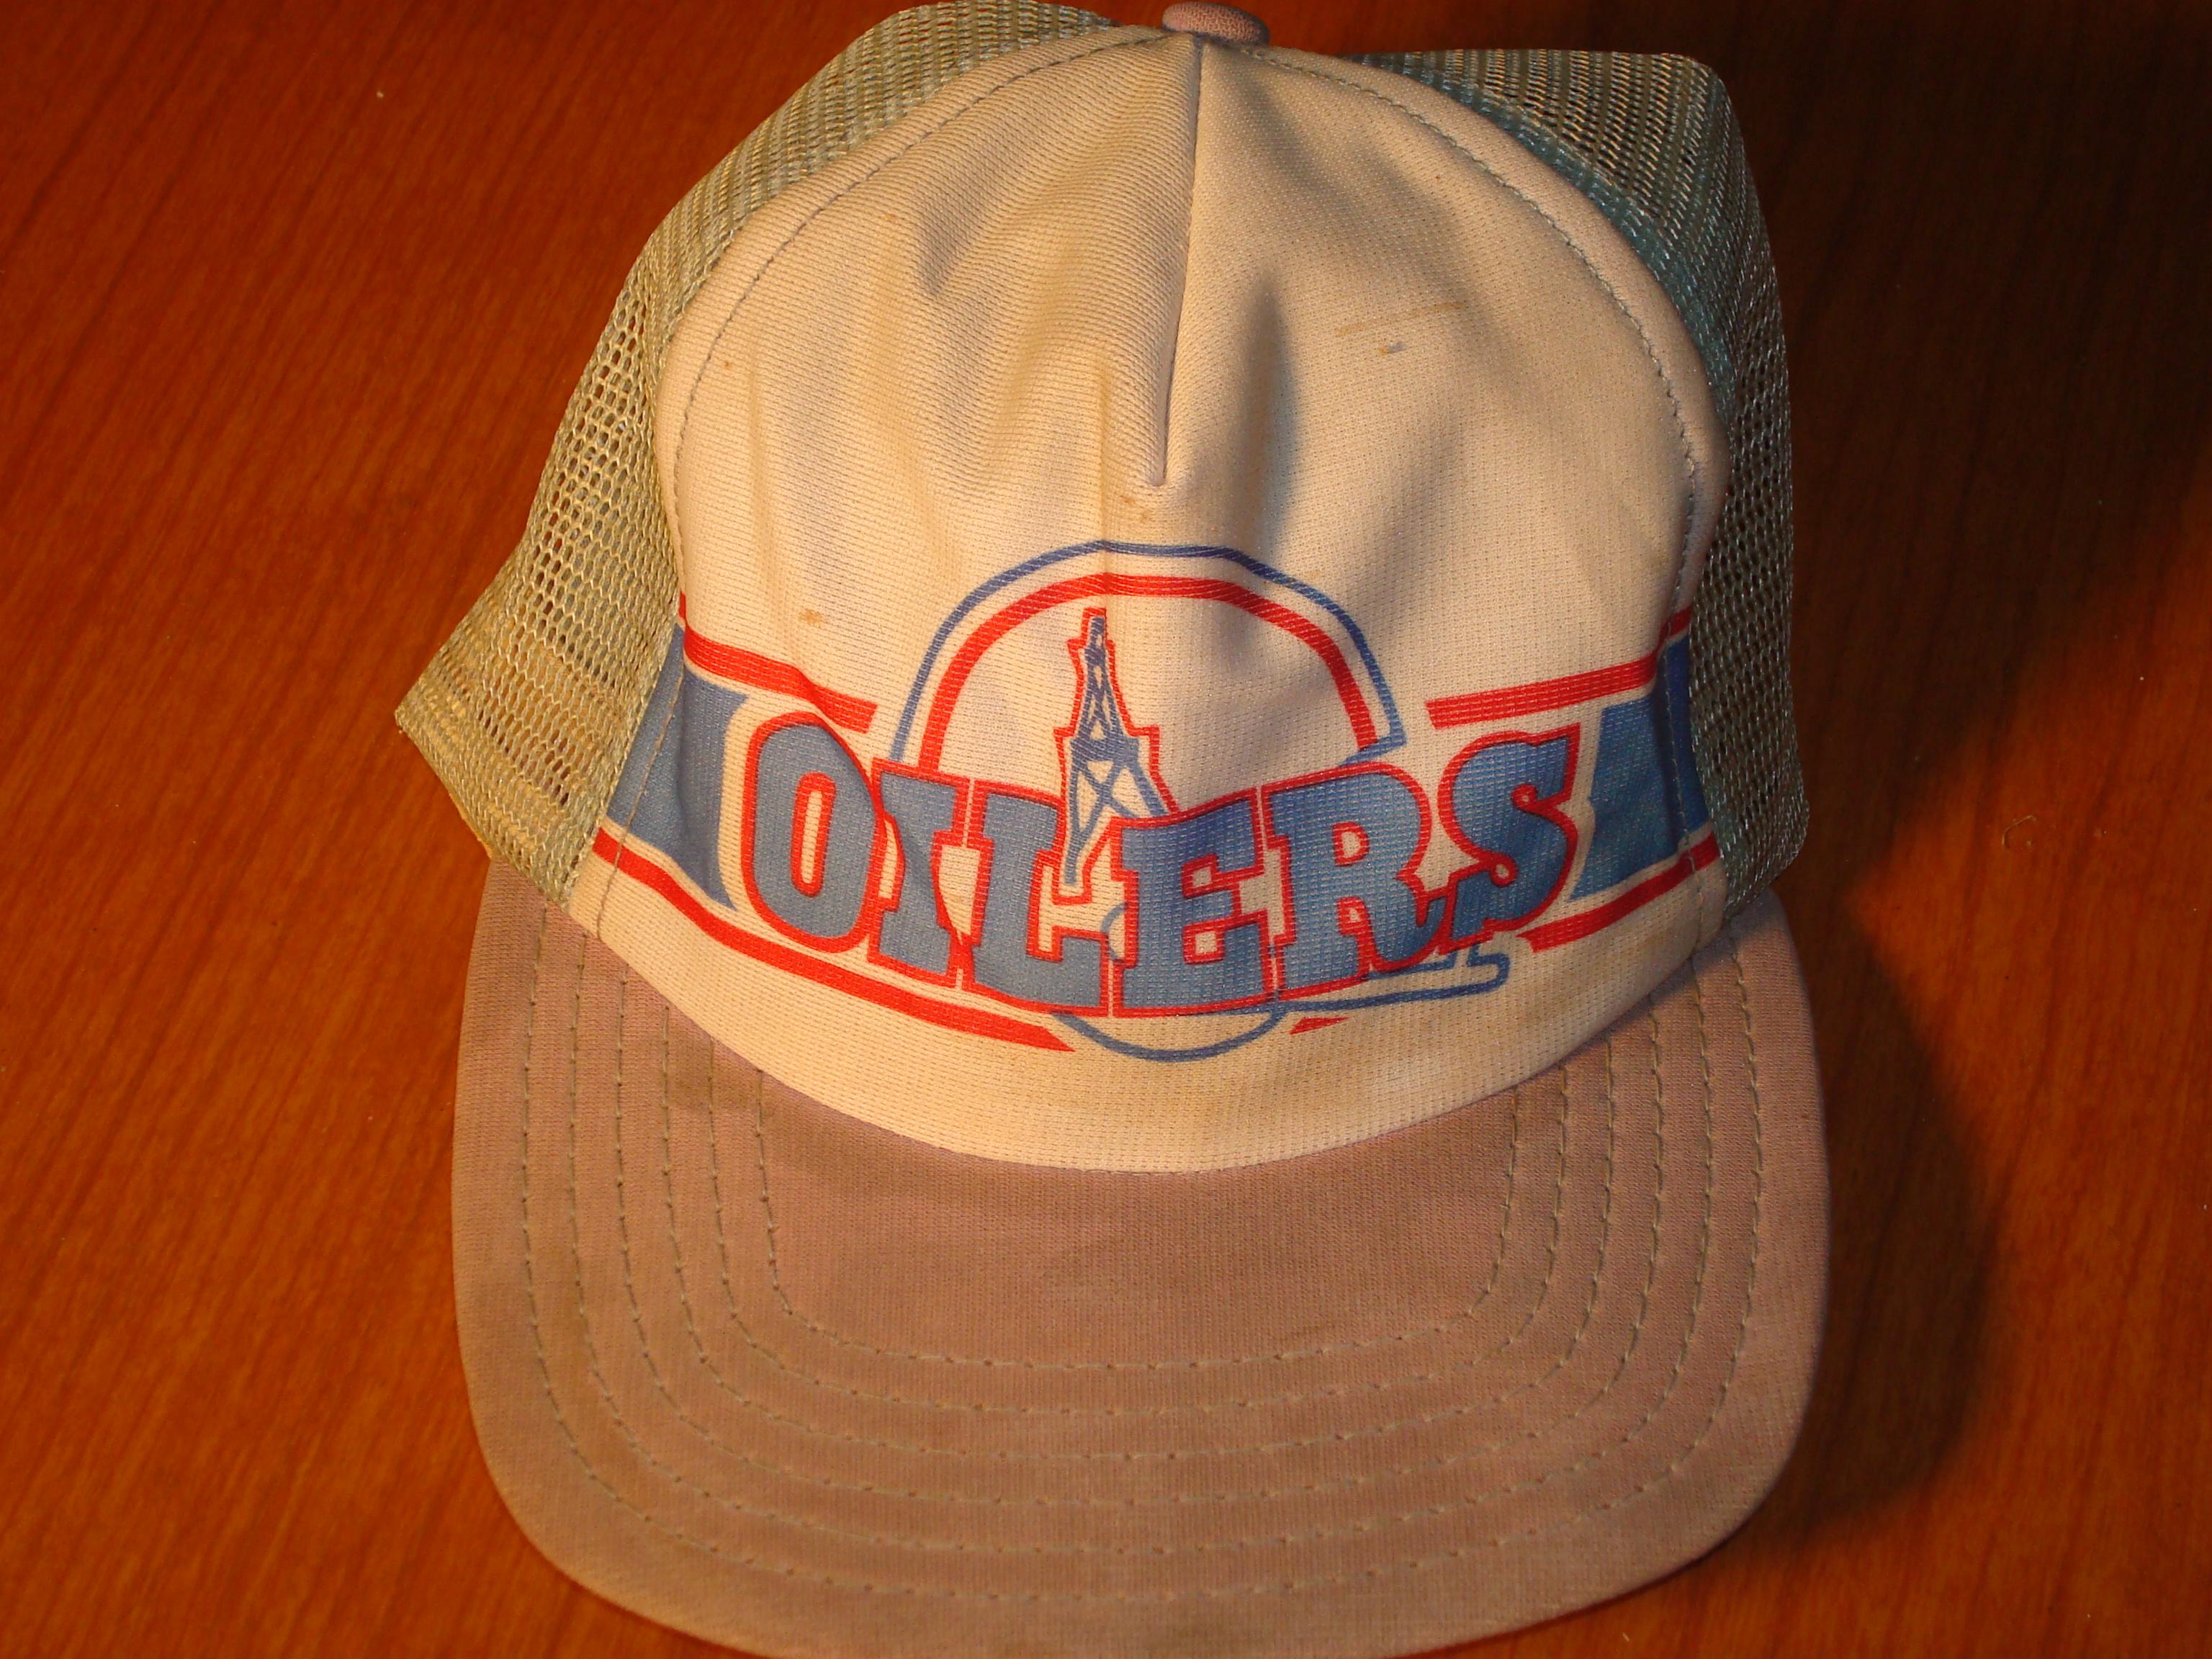 6e884b6621e NFL - Original Souvenier Cap 1978 Houston Oilers coached by Bum Phillips in  RB Earl Campbell